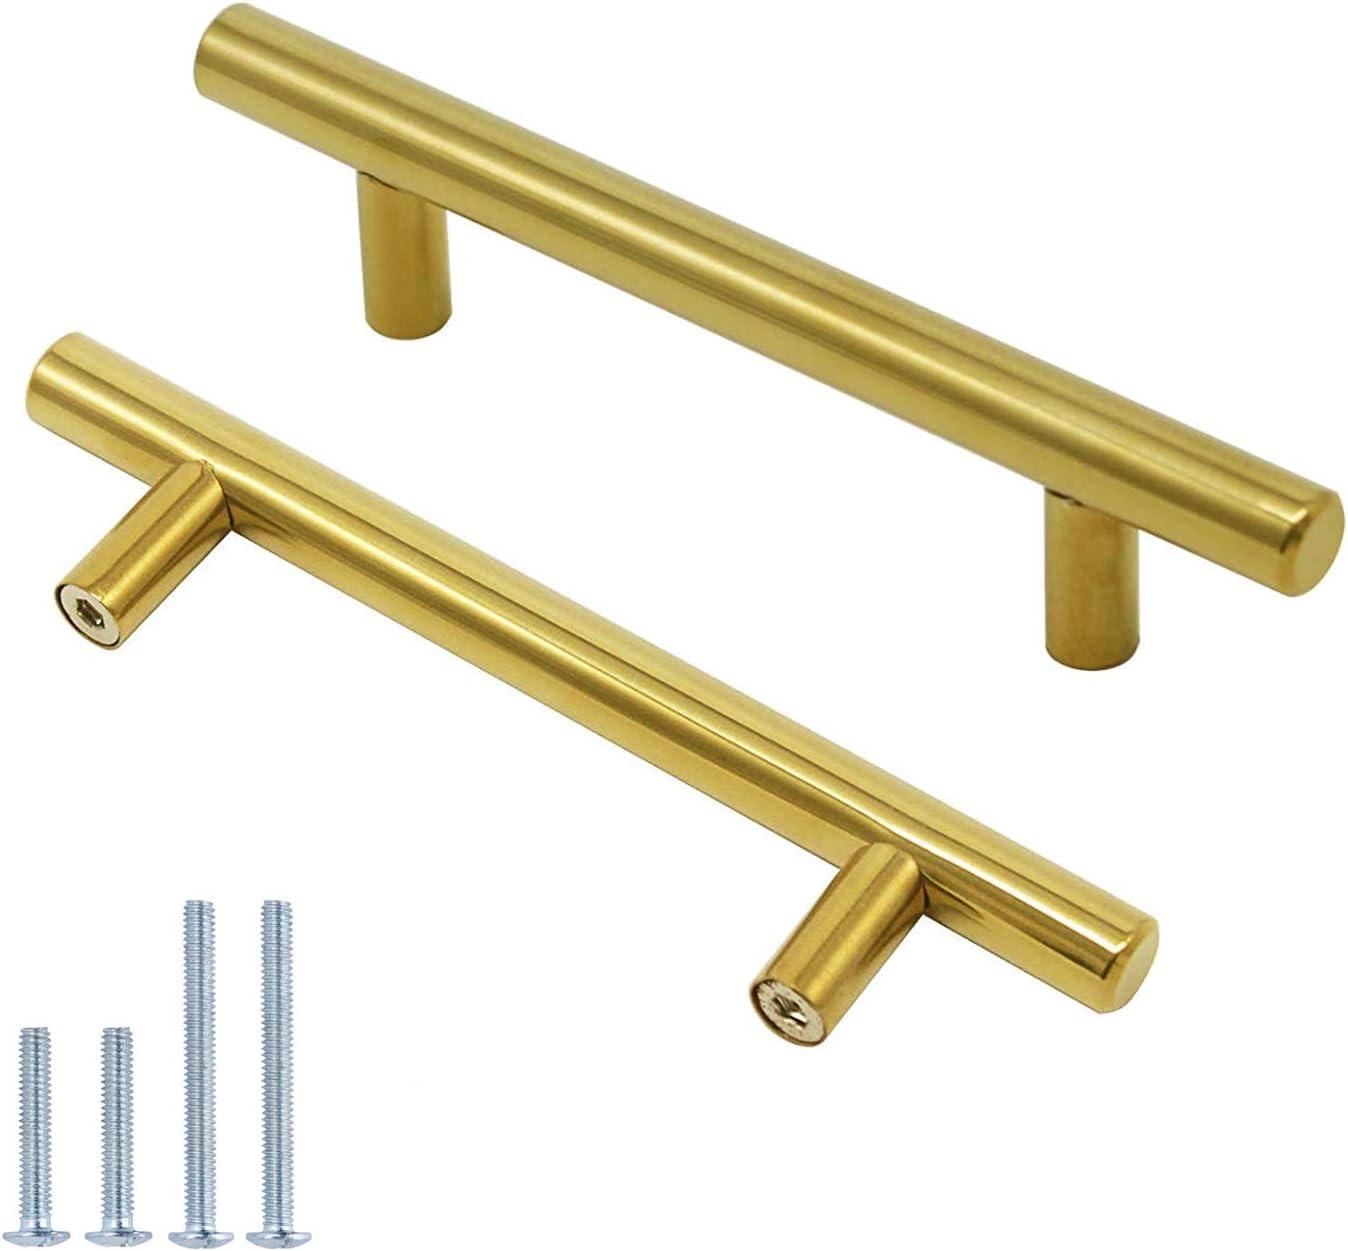 4 Inch Drawer Pulls Brushed Gold Cabinet Handles,10 Pack Stainless Steel Dresser Pull Kitchen Furniture Hardware,Euro T Bar Closet Pull for Bedroom Bathroom Living Room